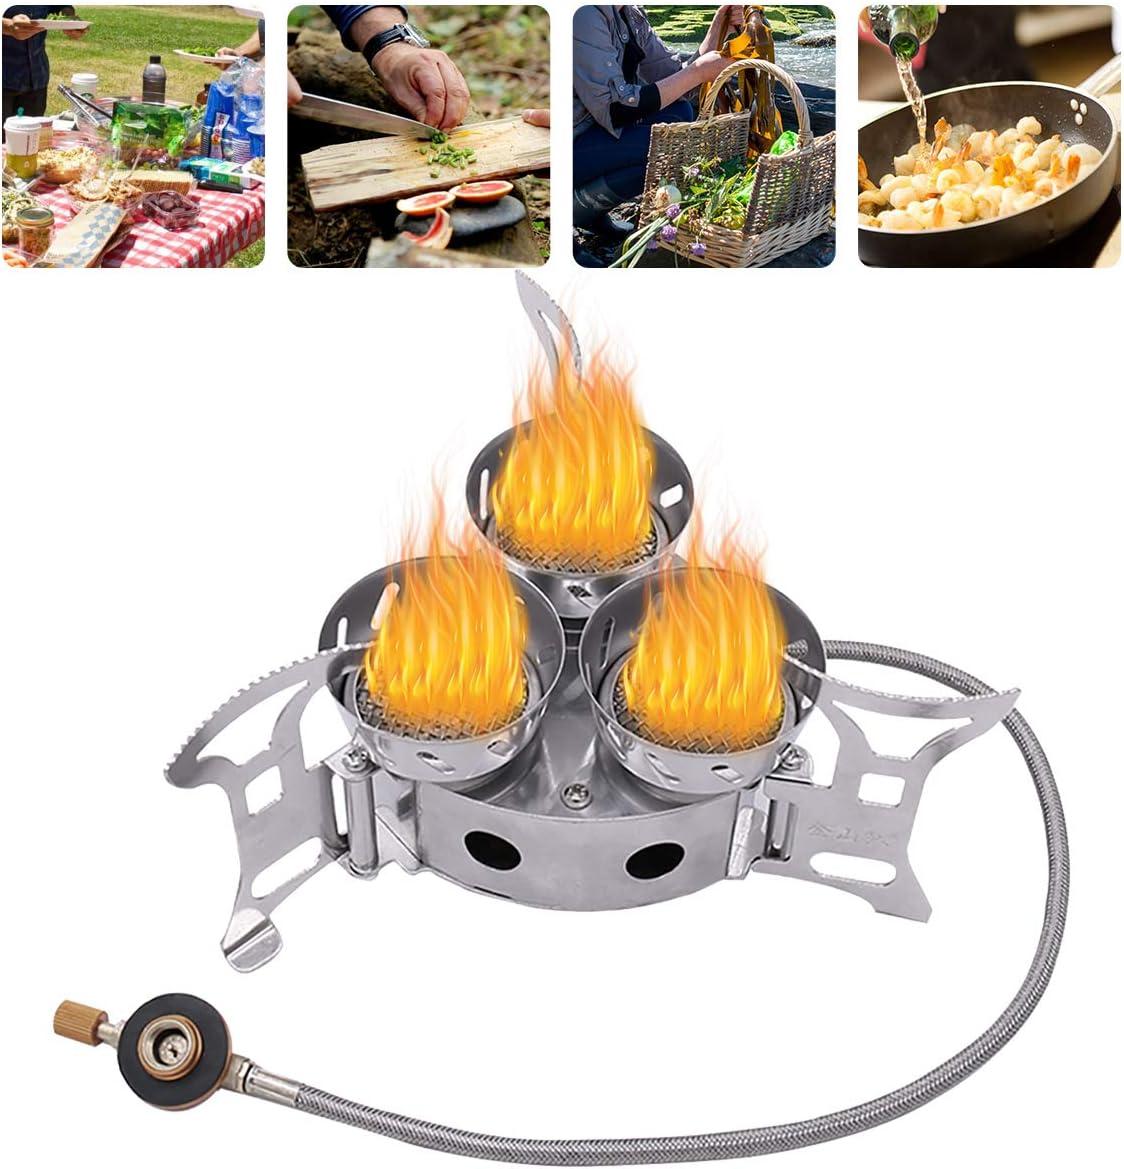 4 Modes Portable Camping Hiking BBQ Picnic Stove Gas Cooker Burner Foldable QU78